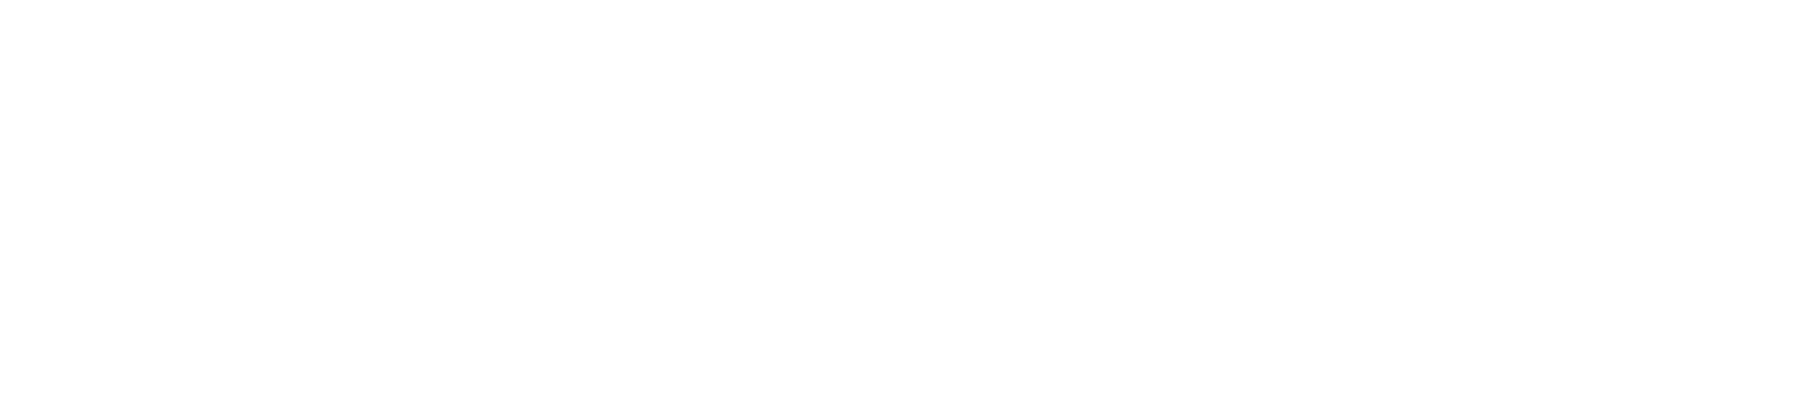 Agma Clinic Logo